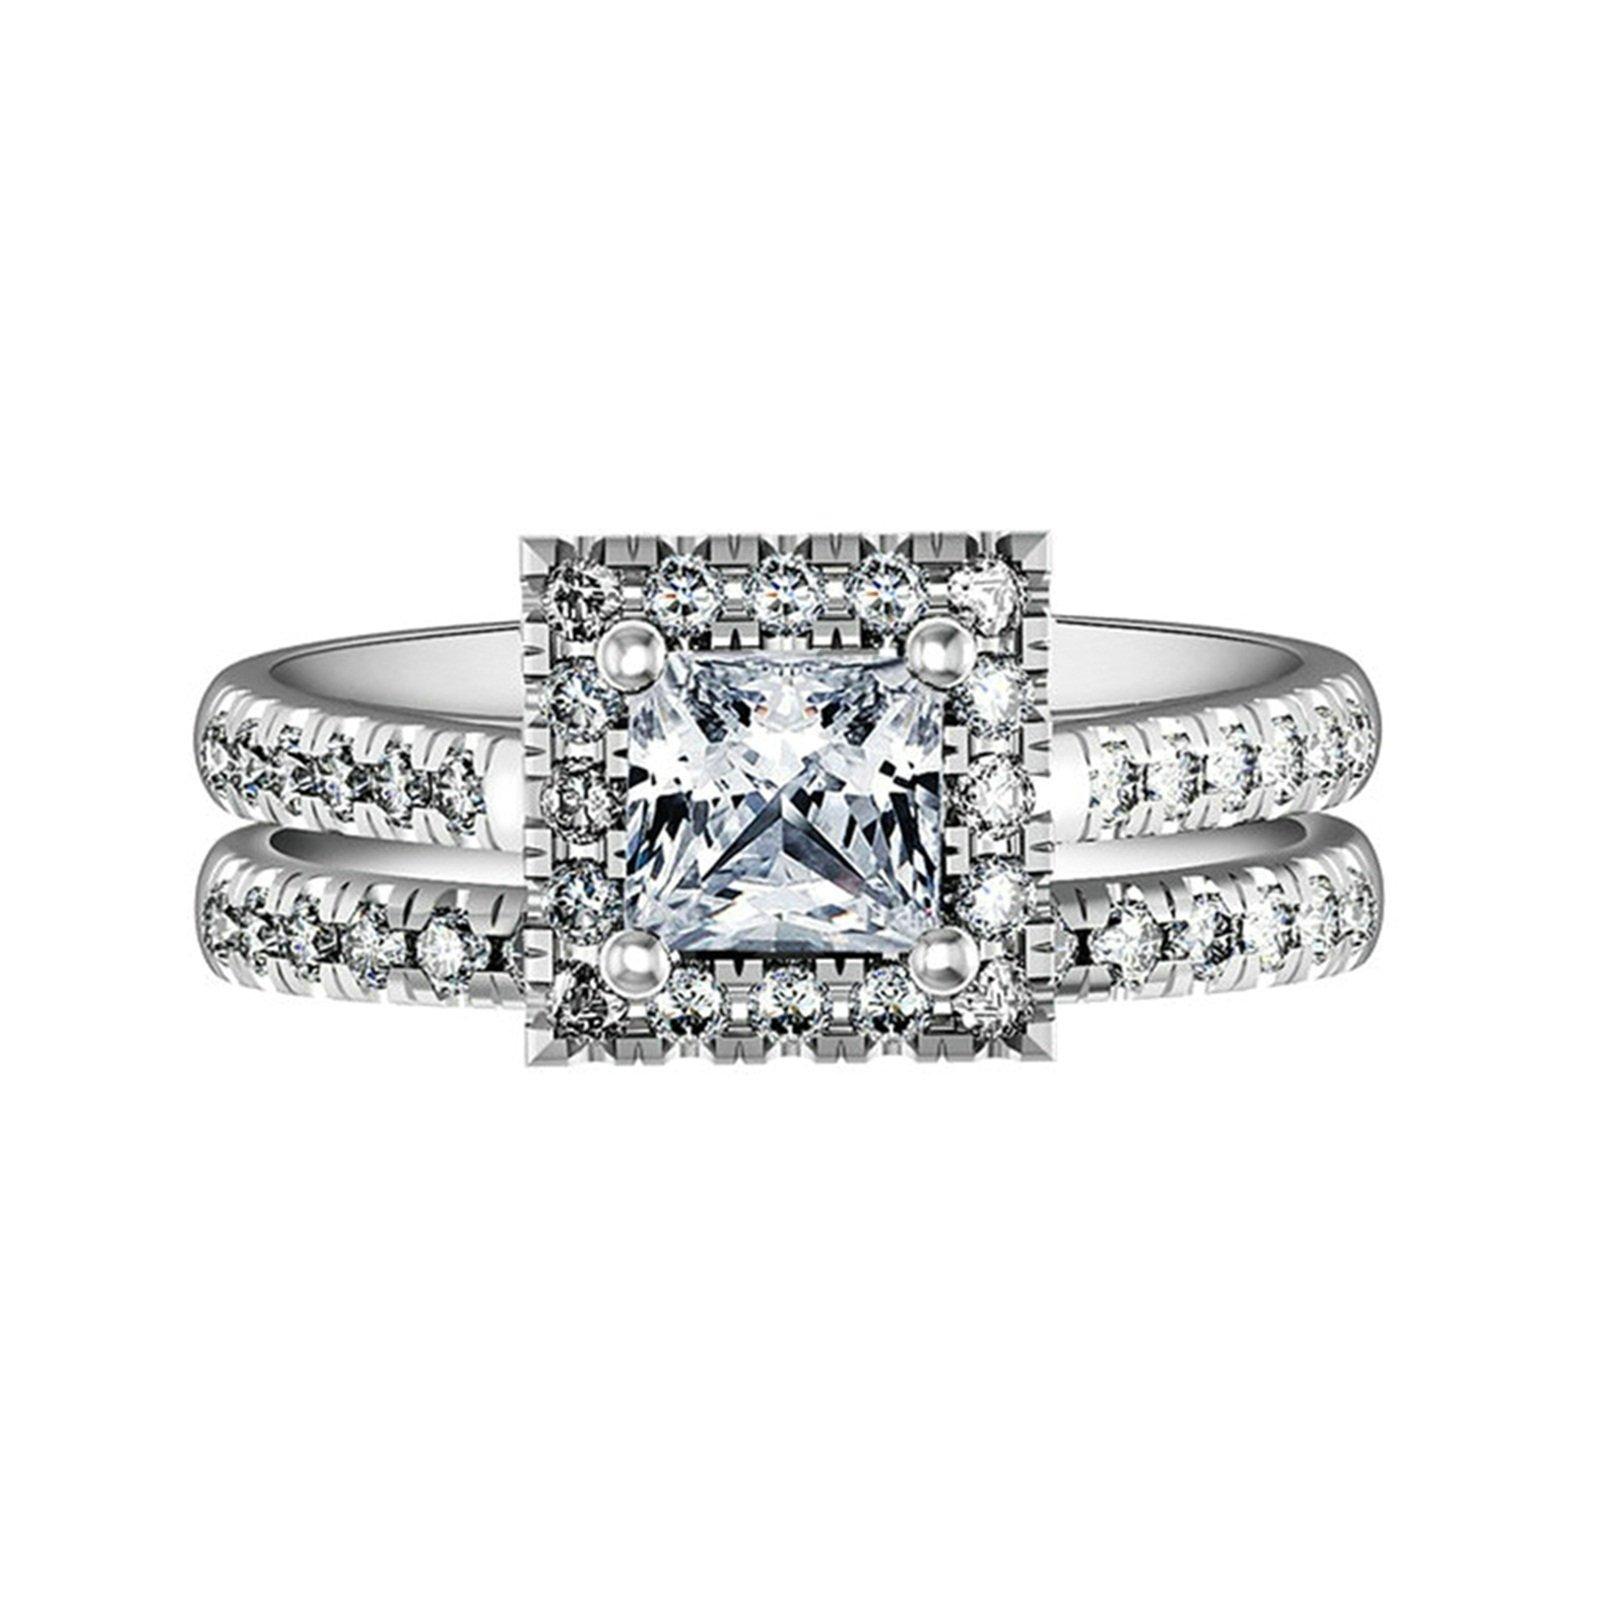 Beydodo Engagement Ring Zirconia 4-prong Setting Princess & Round Cut Crystal Size 9 Anniversary Gift